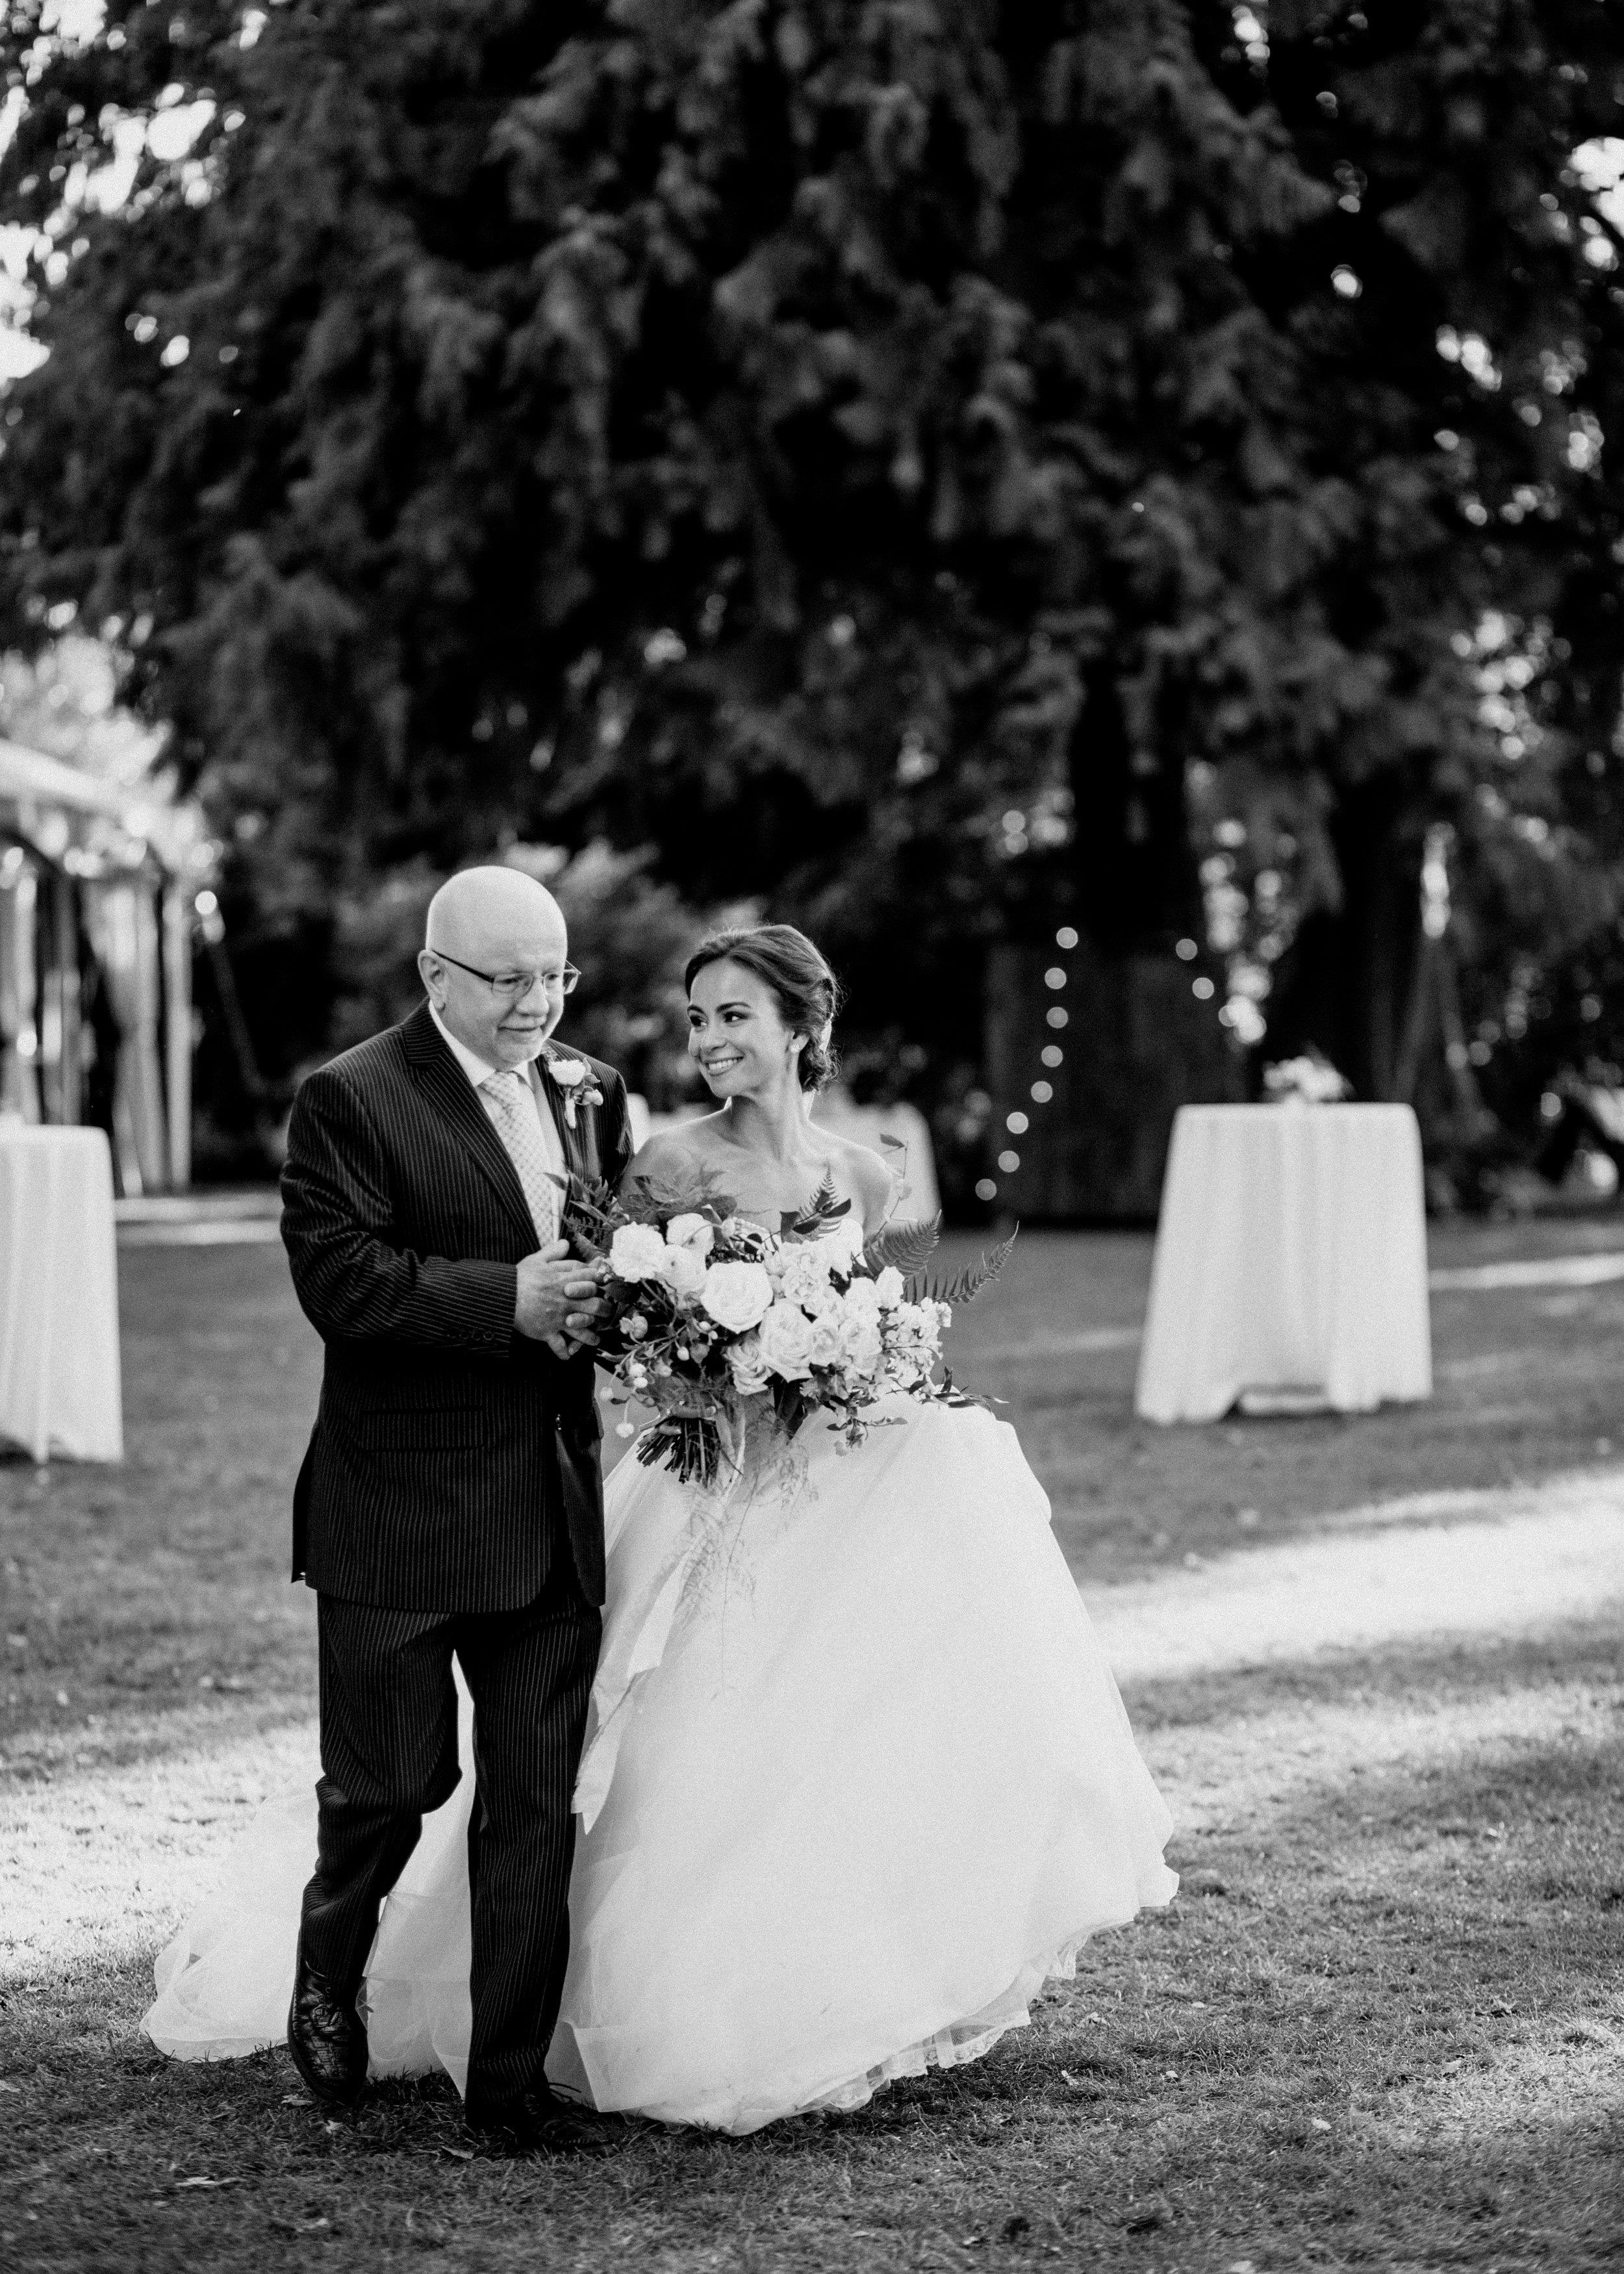 herafilms_carlotta_alex_wedding_hera_highres-45.jpg